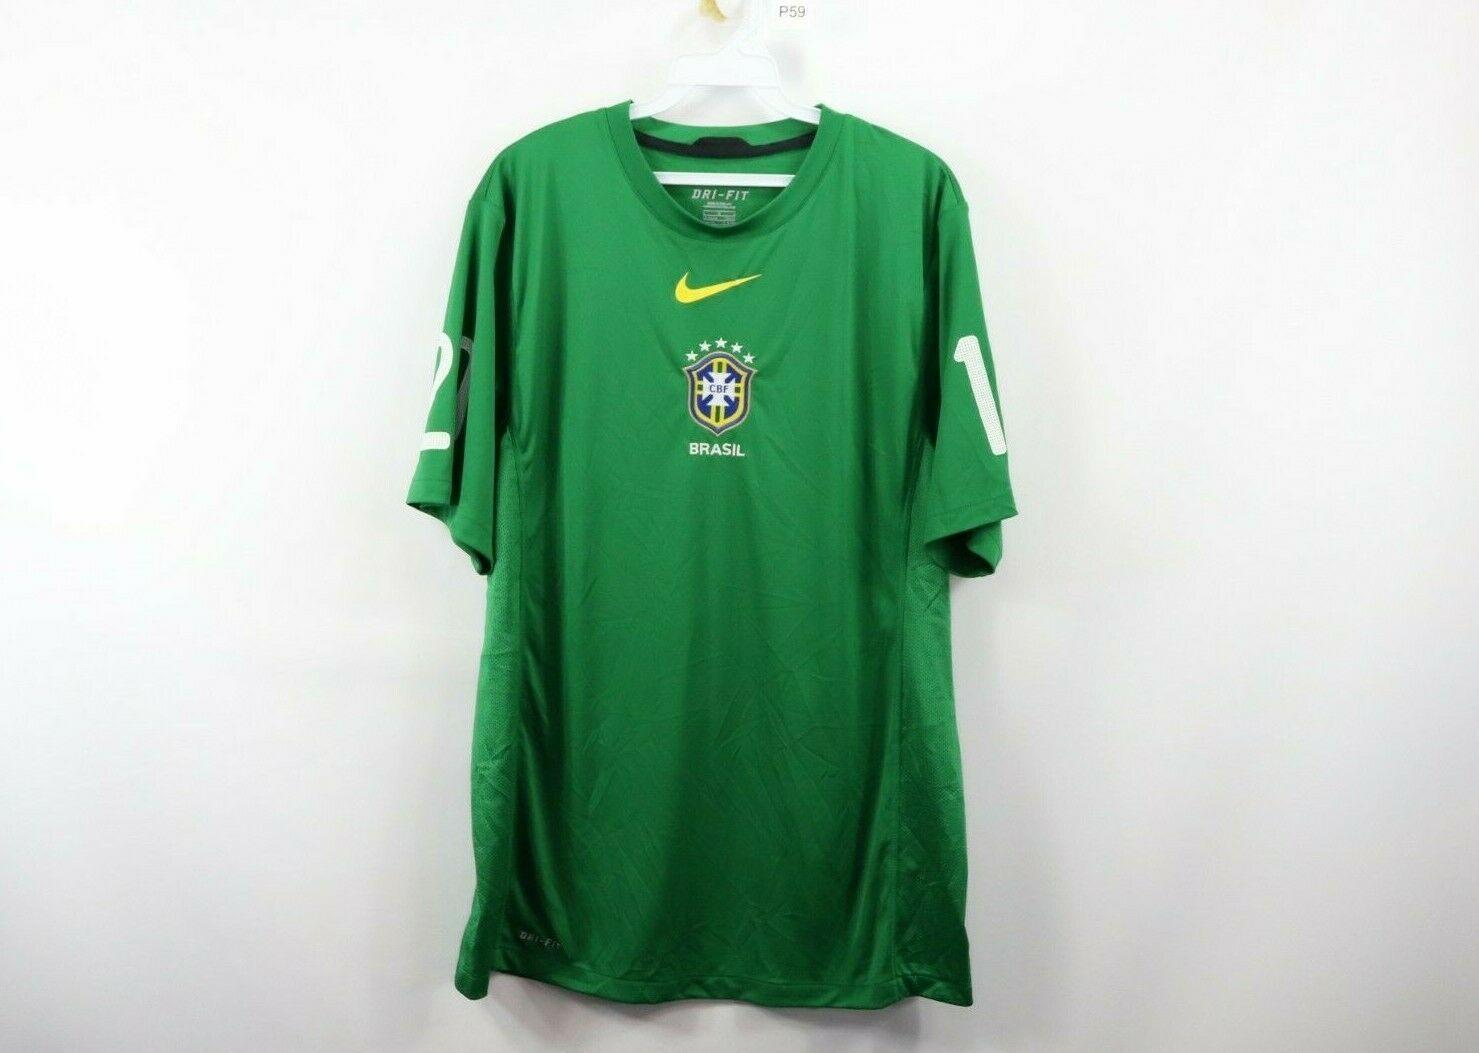 8f1b9bb35d9 57. 57. Previous. Nike Mens Large Dri-Fit Training 2010 World Cup Brasil  Brazil Soccer Jersey Tee